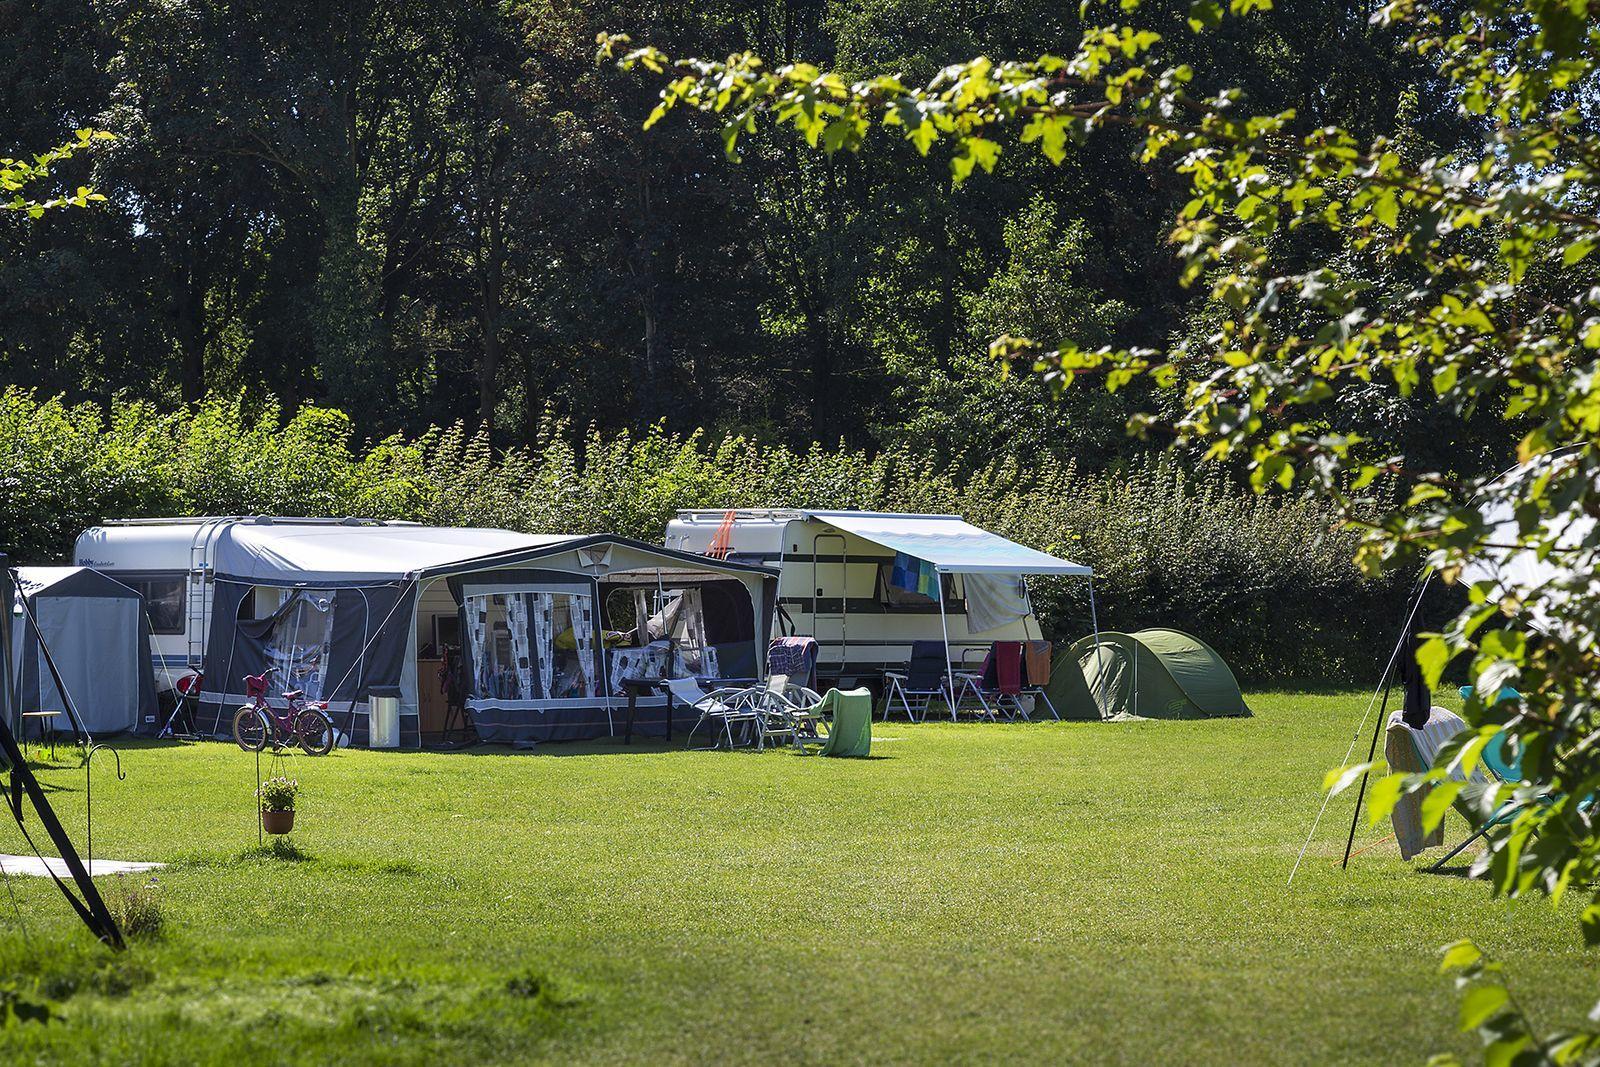 Campingplatz 10 Ampere